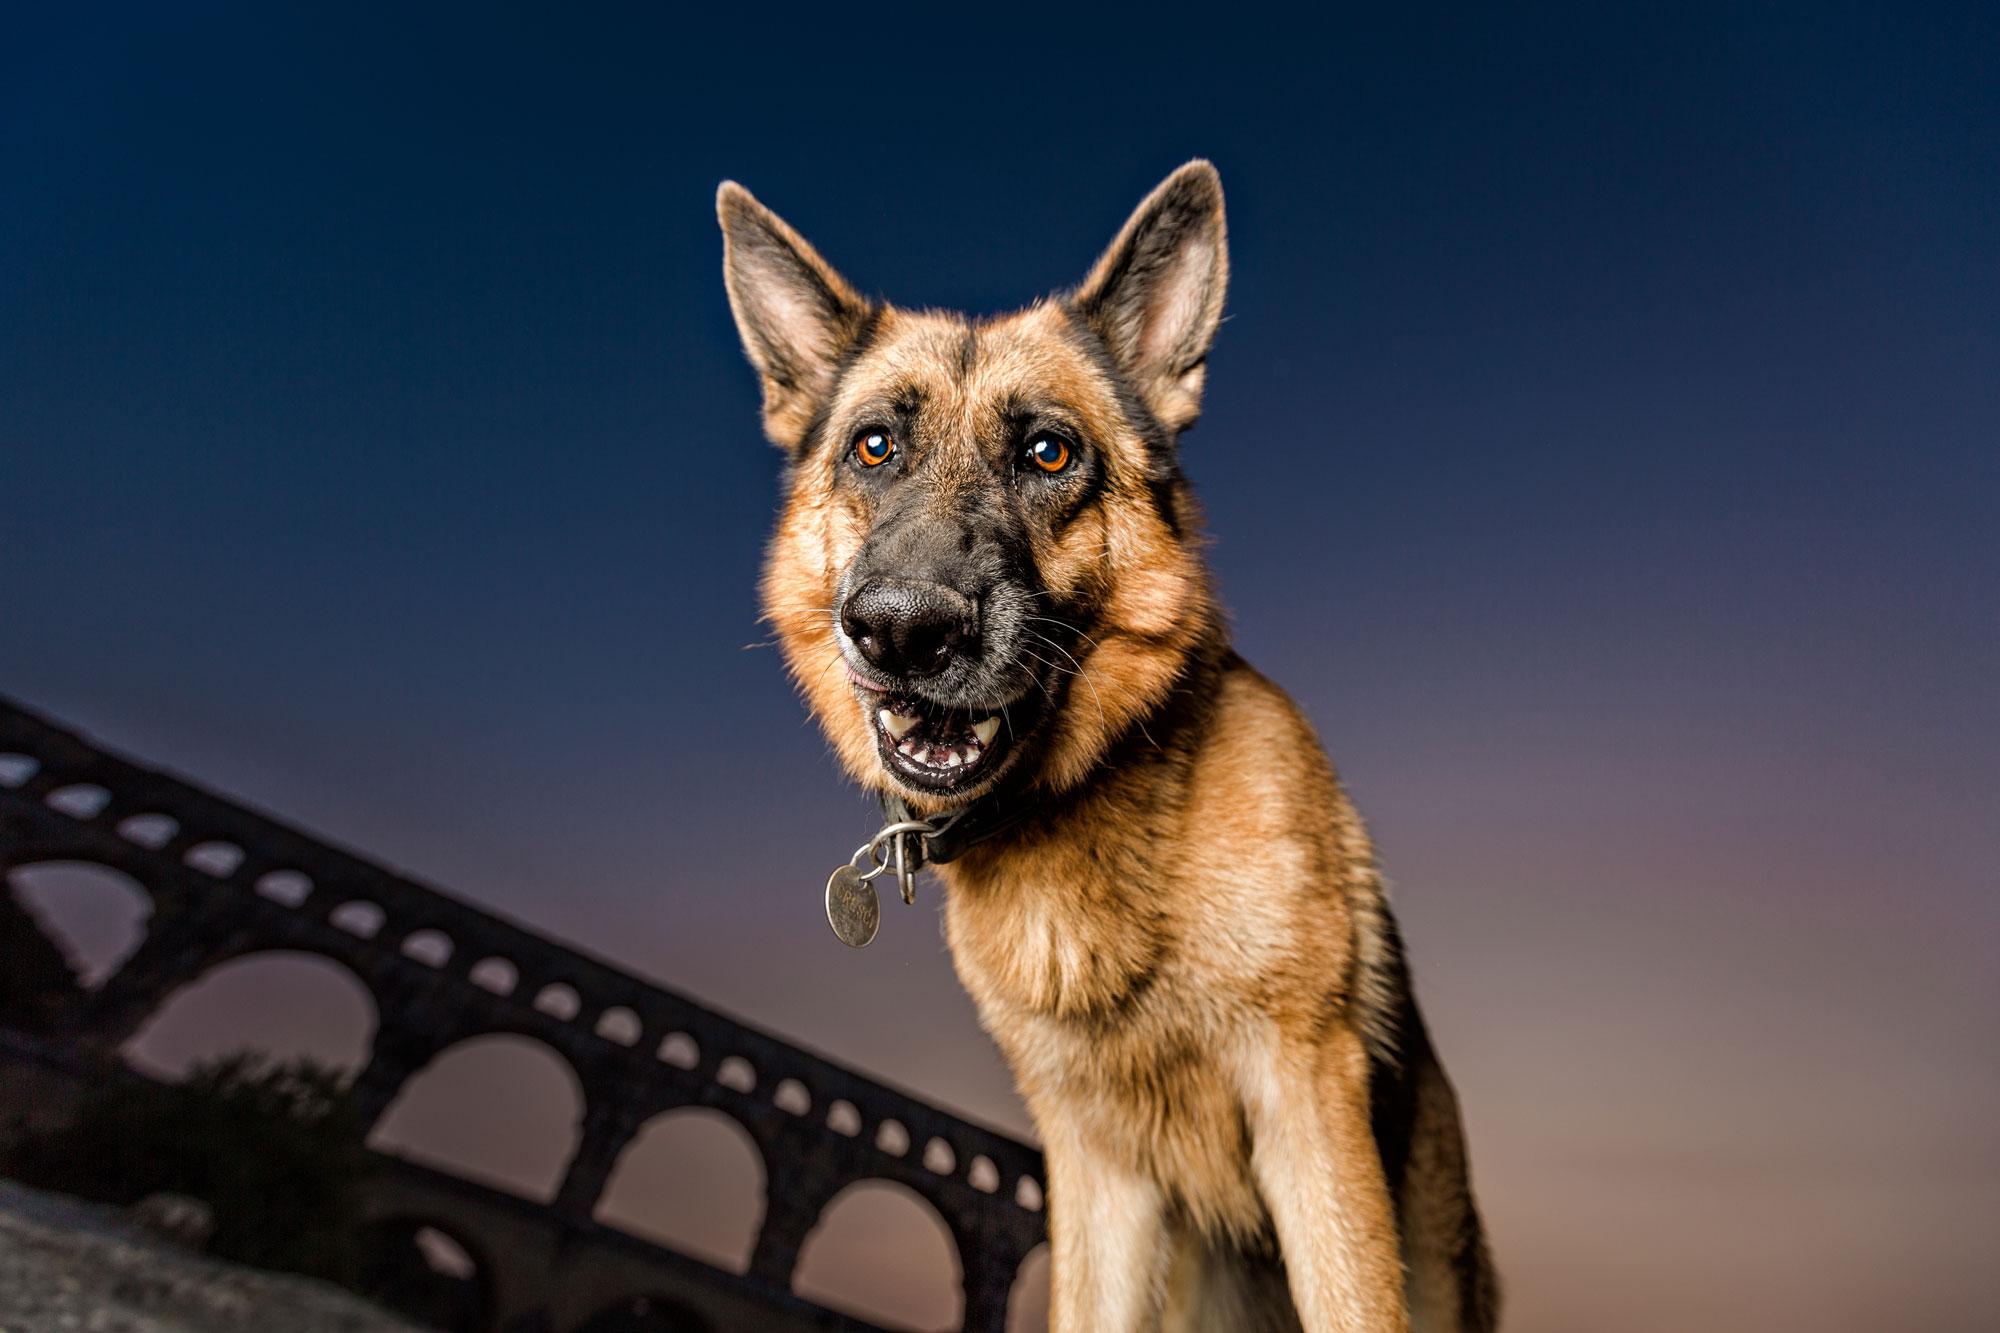 NJ Dog Photographer Leslie Leda